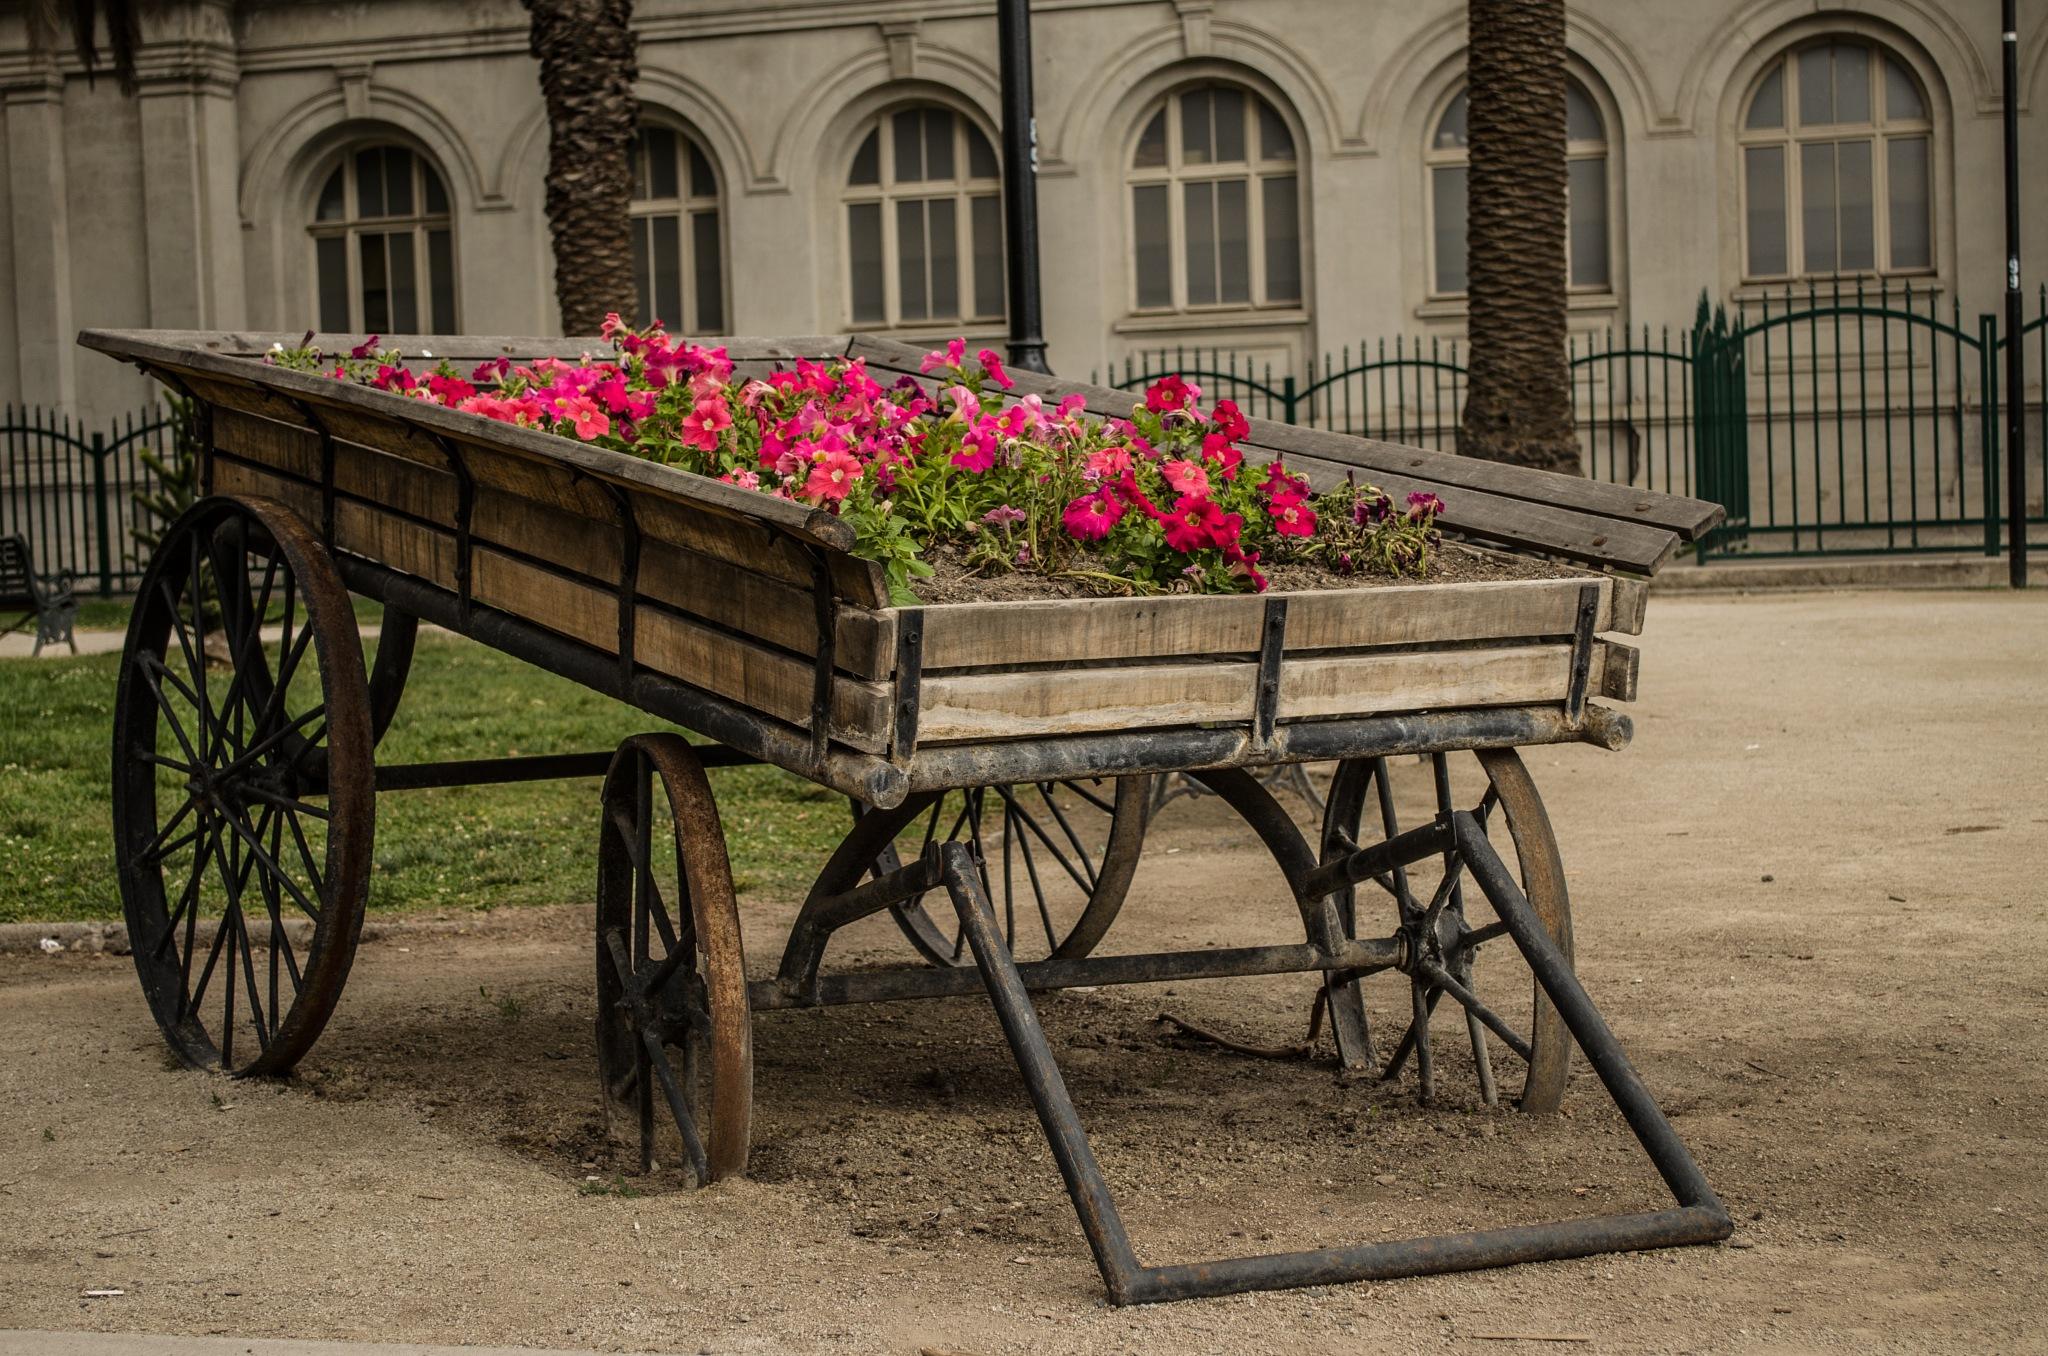 carreta floreada en parque quinta normal santiago chile octubre 2016 by Aossandon